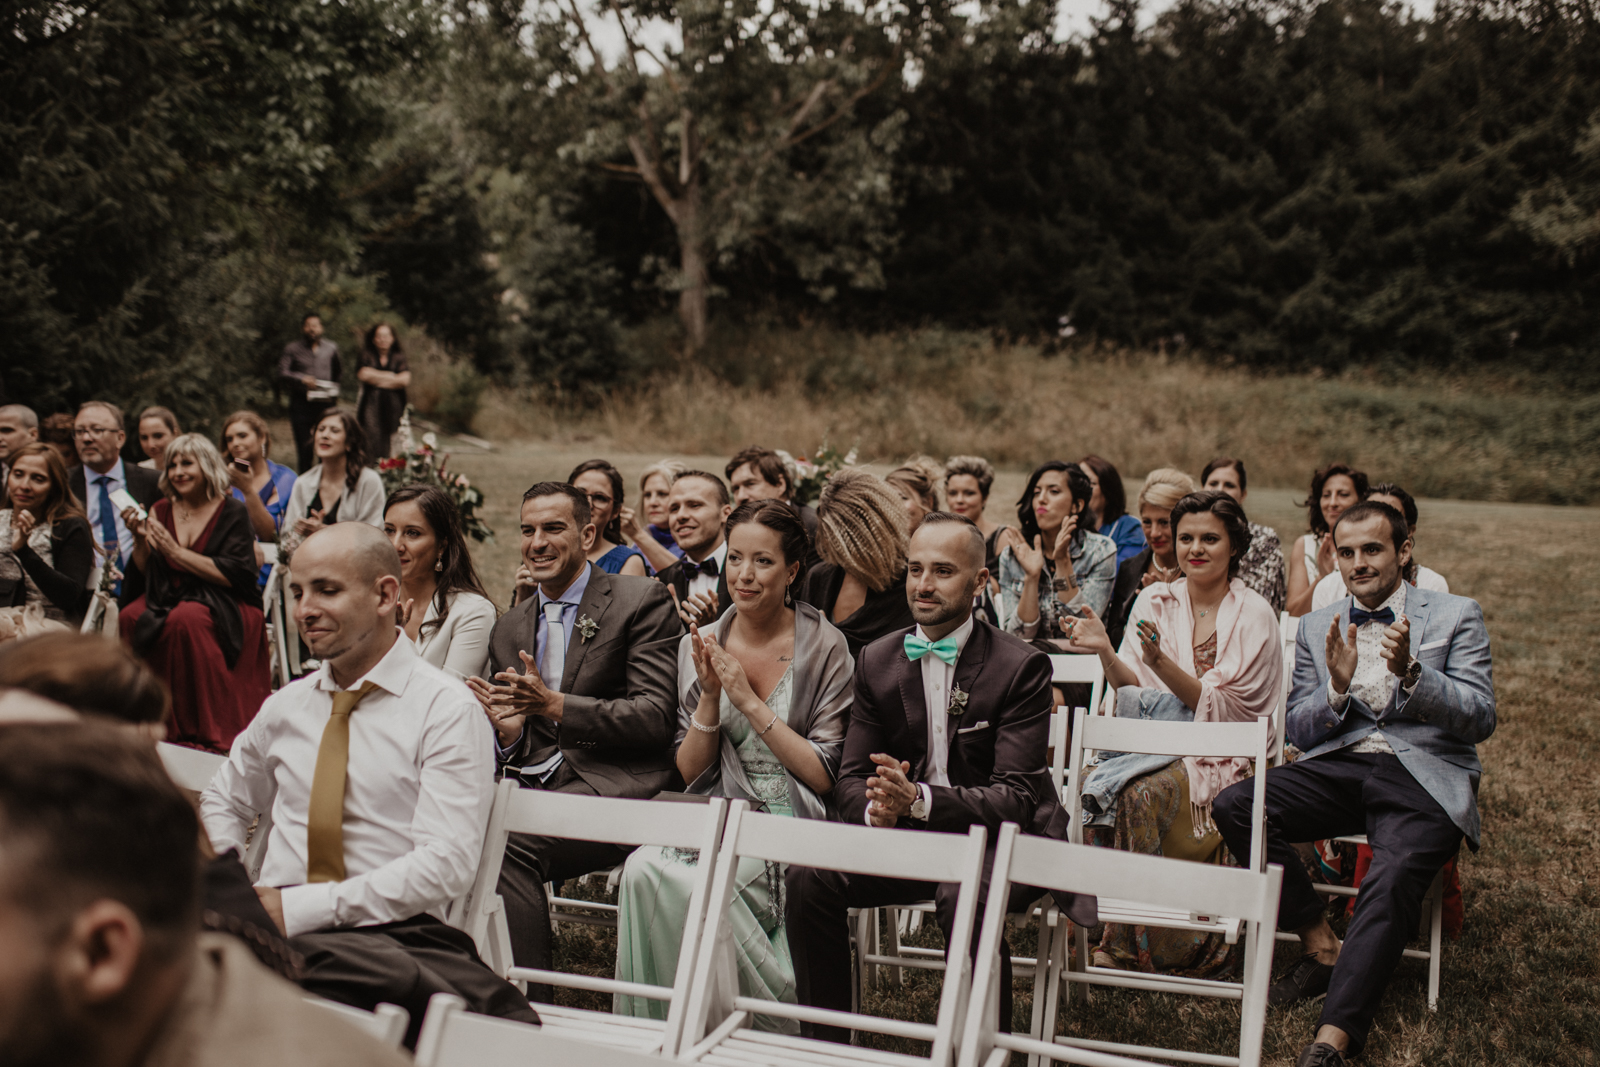 thenortherngirlphotography_photography_thenortherngirl_rebeccascabros_wedding_weddingphotography_weddingphotographer_barcelona_bodaenbarcelona_bodaenmaselmarti_bodarogeryvane-388.jpg